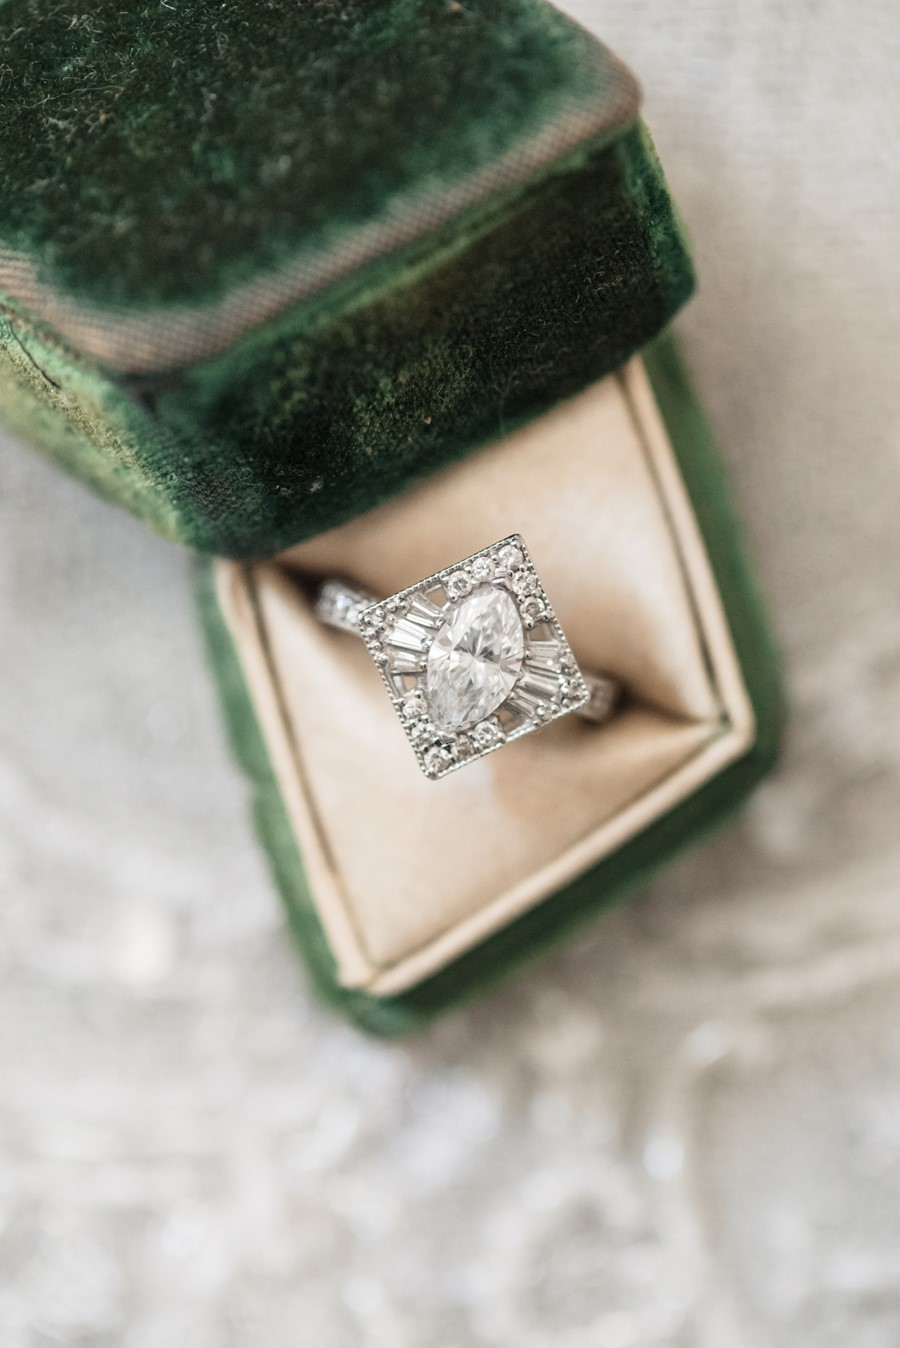 Vintage White Gold Engagement Ring